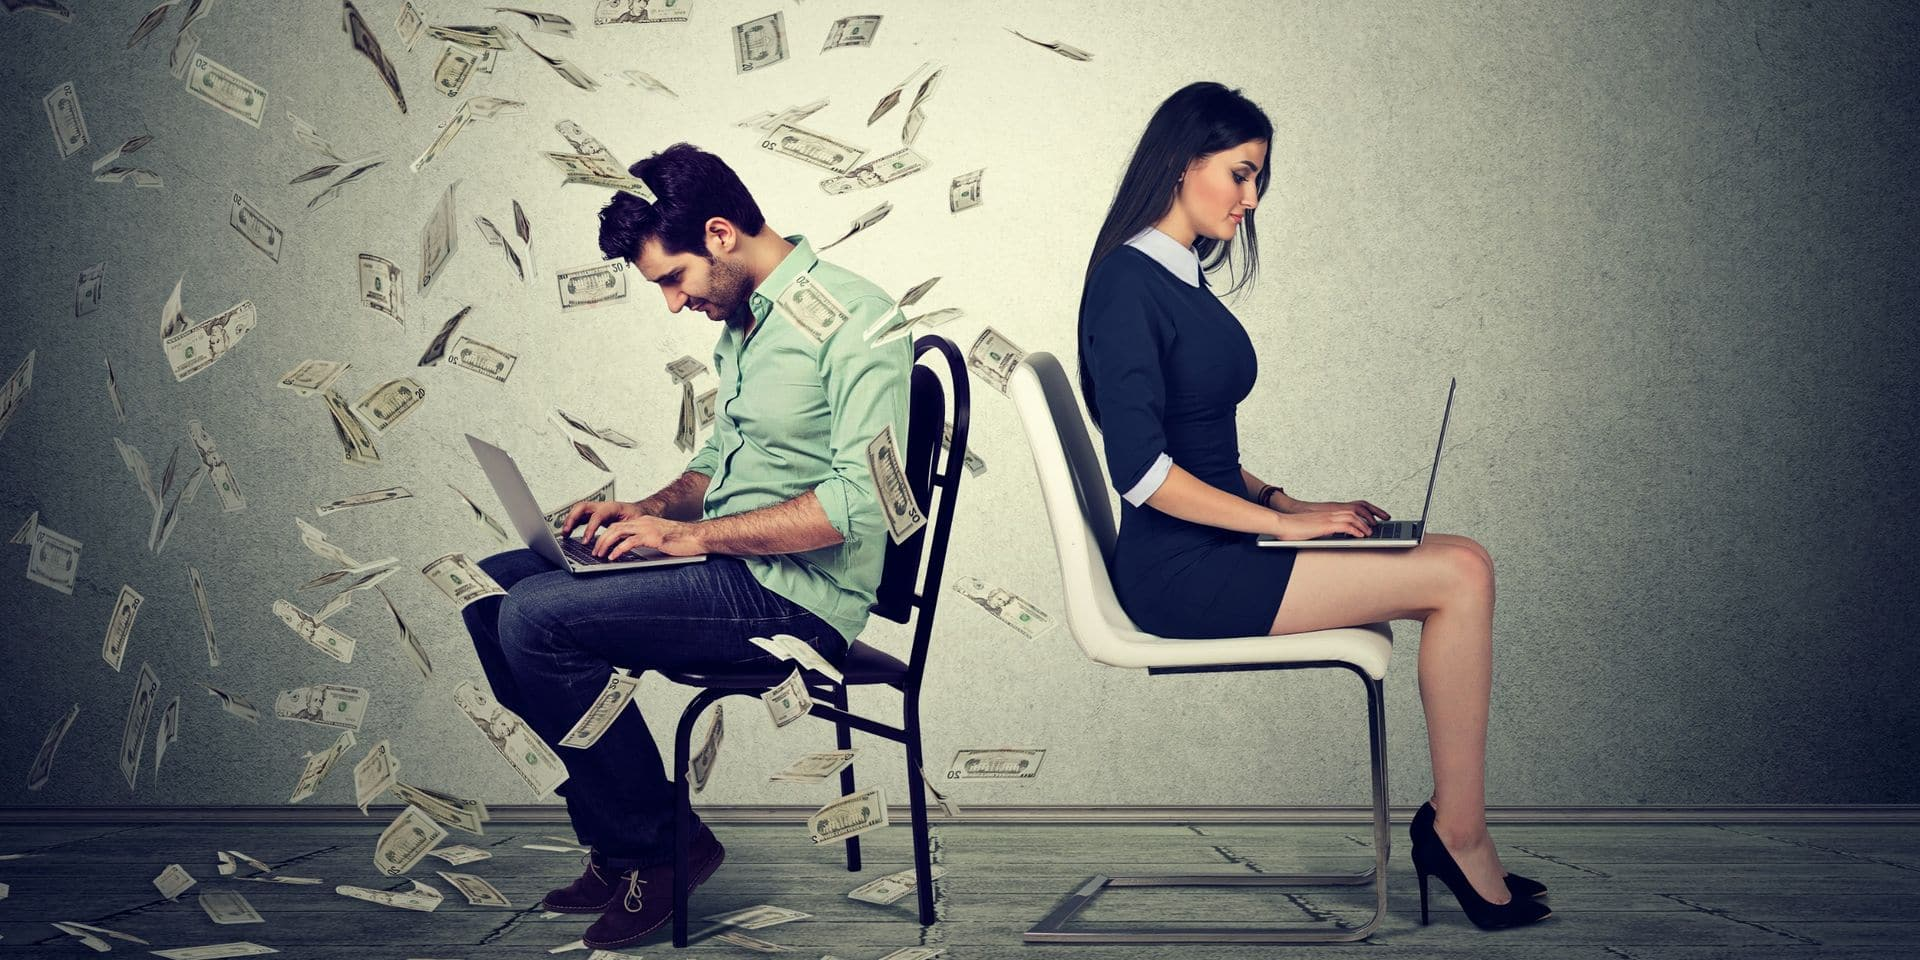 Salaires hommes-femmes: la Belgique pointée du doigt